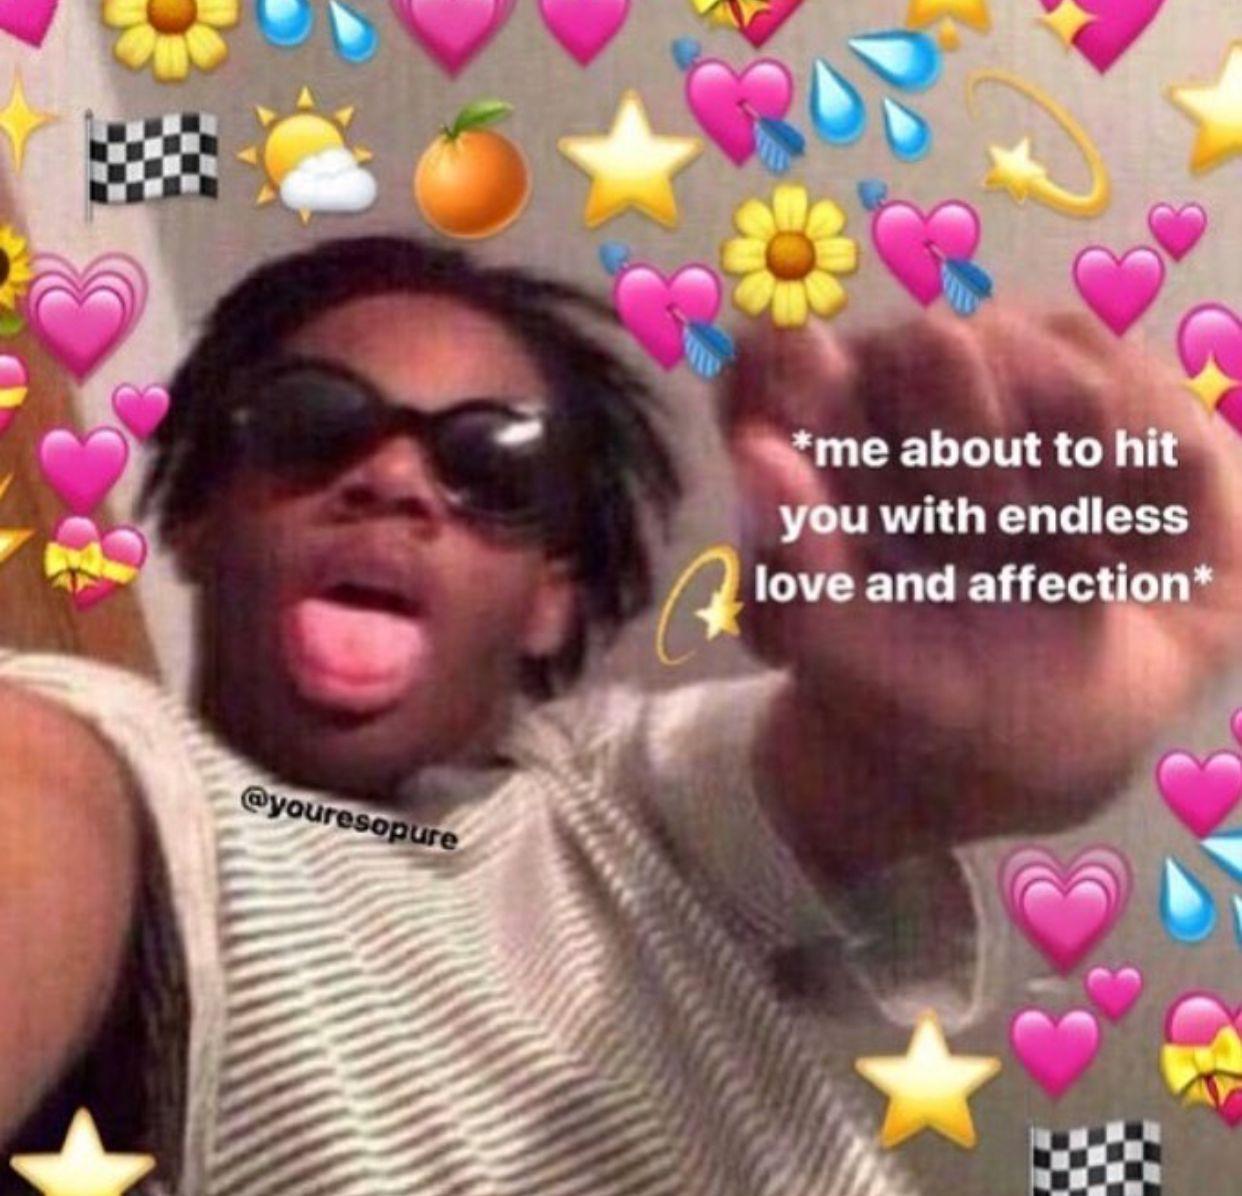 ᴘɪɴᴛᴇʀᴇsᴛ ʙᴇsᴛʙʏᴍʏsᴇʟғ ♔ (With images) Love memes, Cute